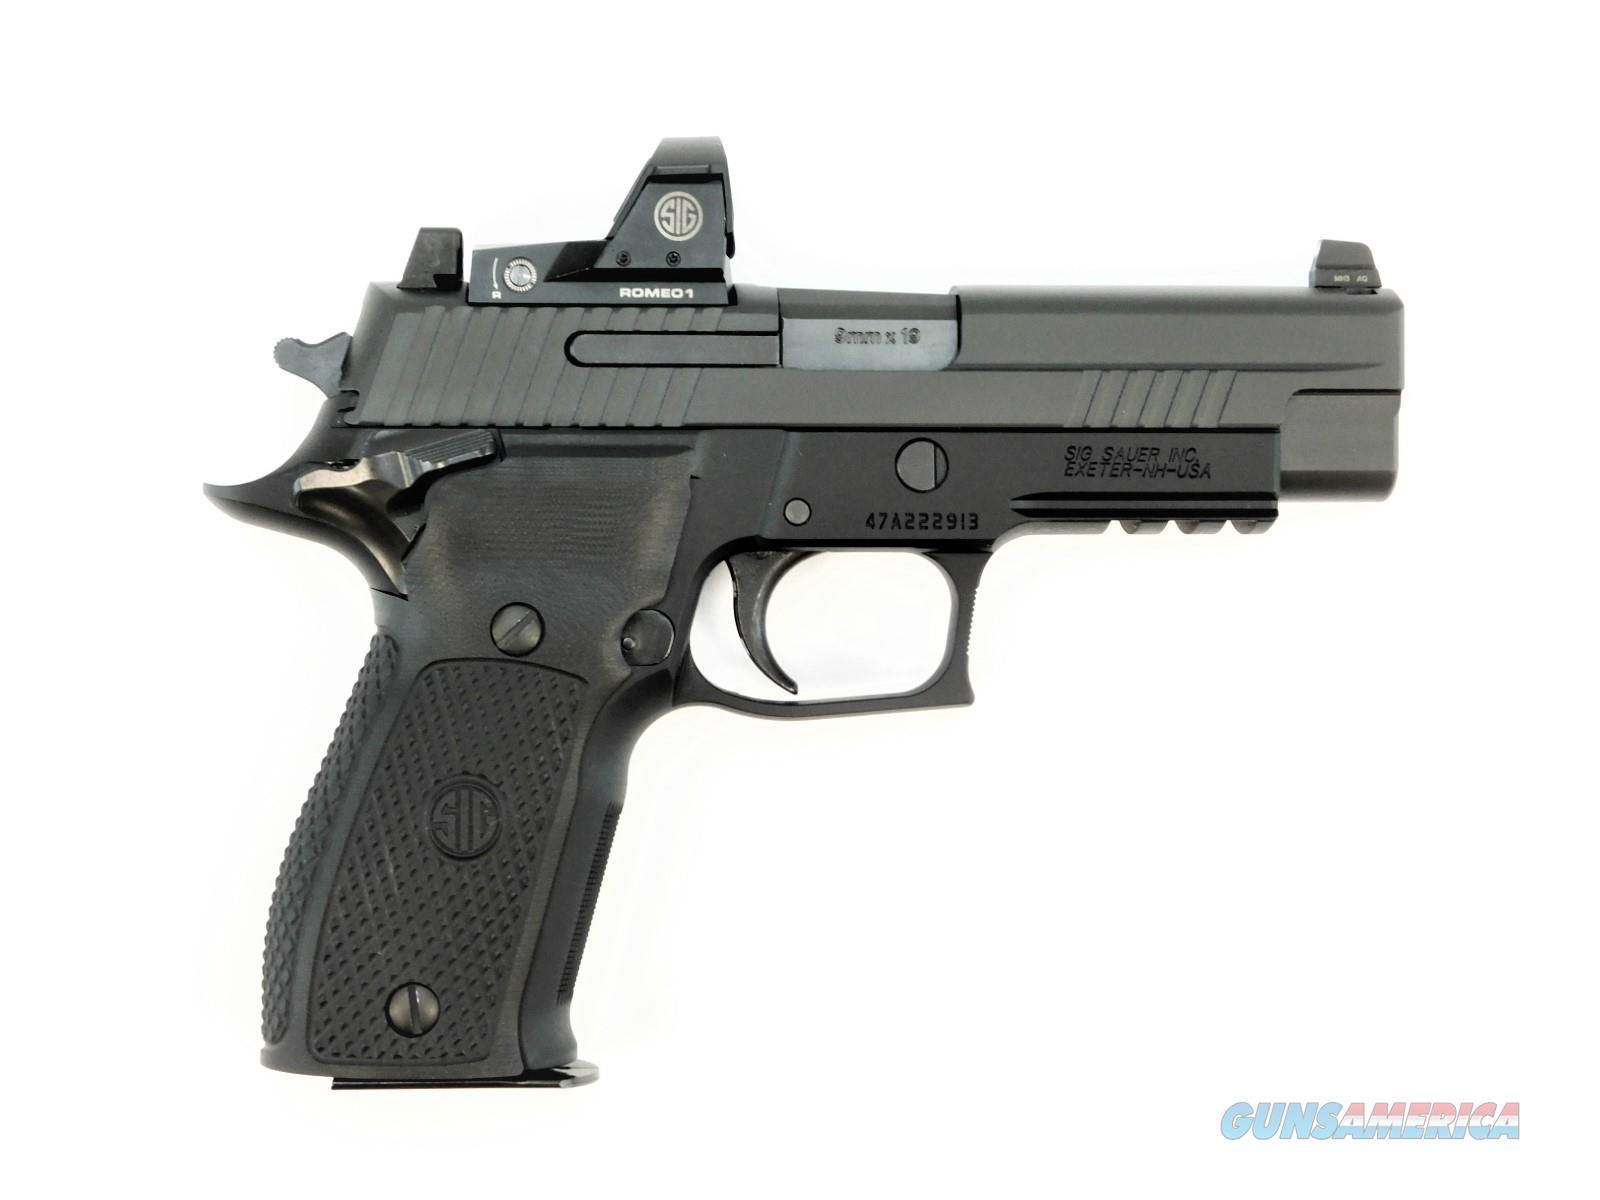 Sig Sauer P226 9MM RX Romeo SAO E26R-9-BSE-SAO-RX  Guns > Pistols > Sig - Sauer/Sigarms Pistols > P226